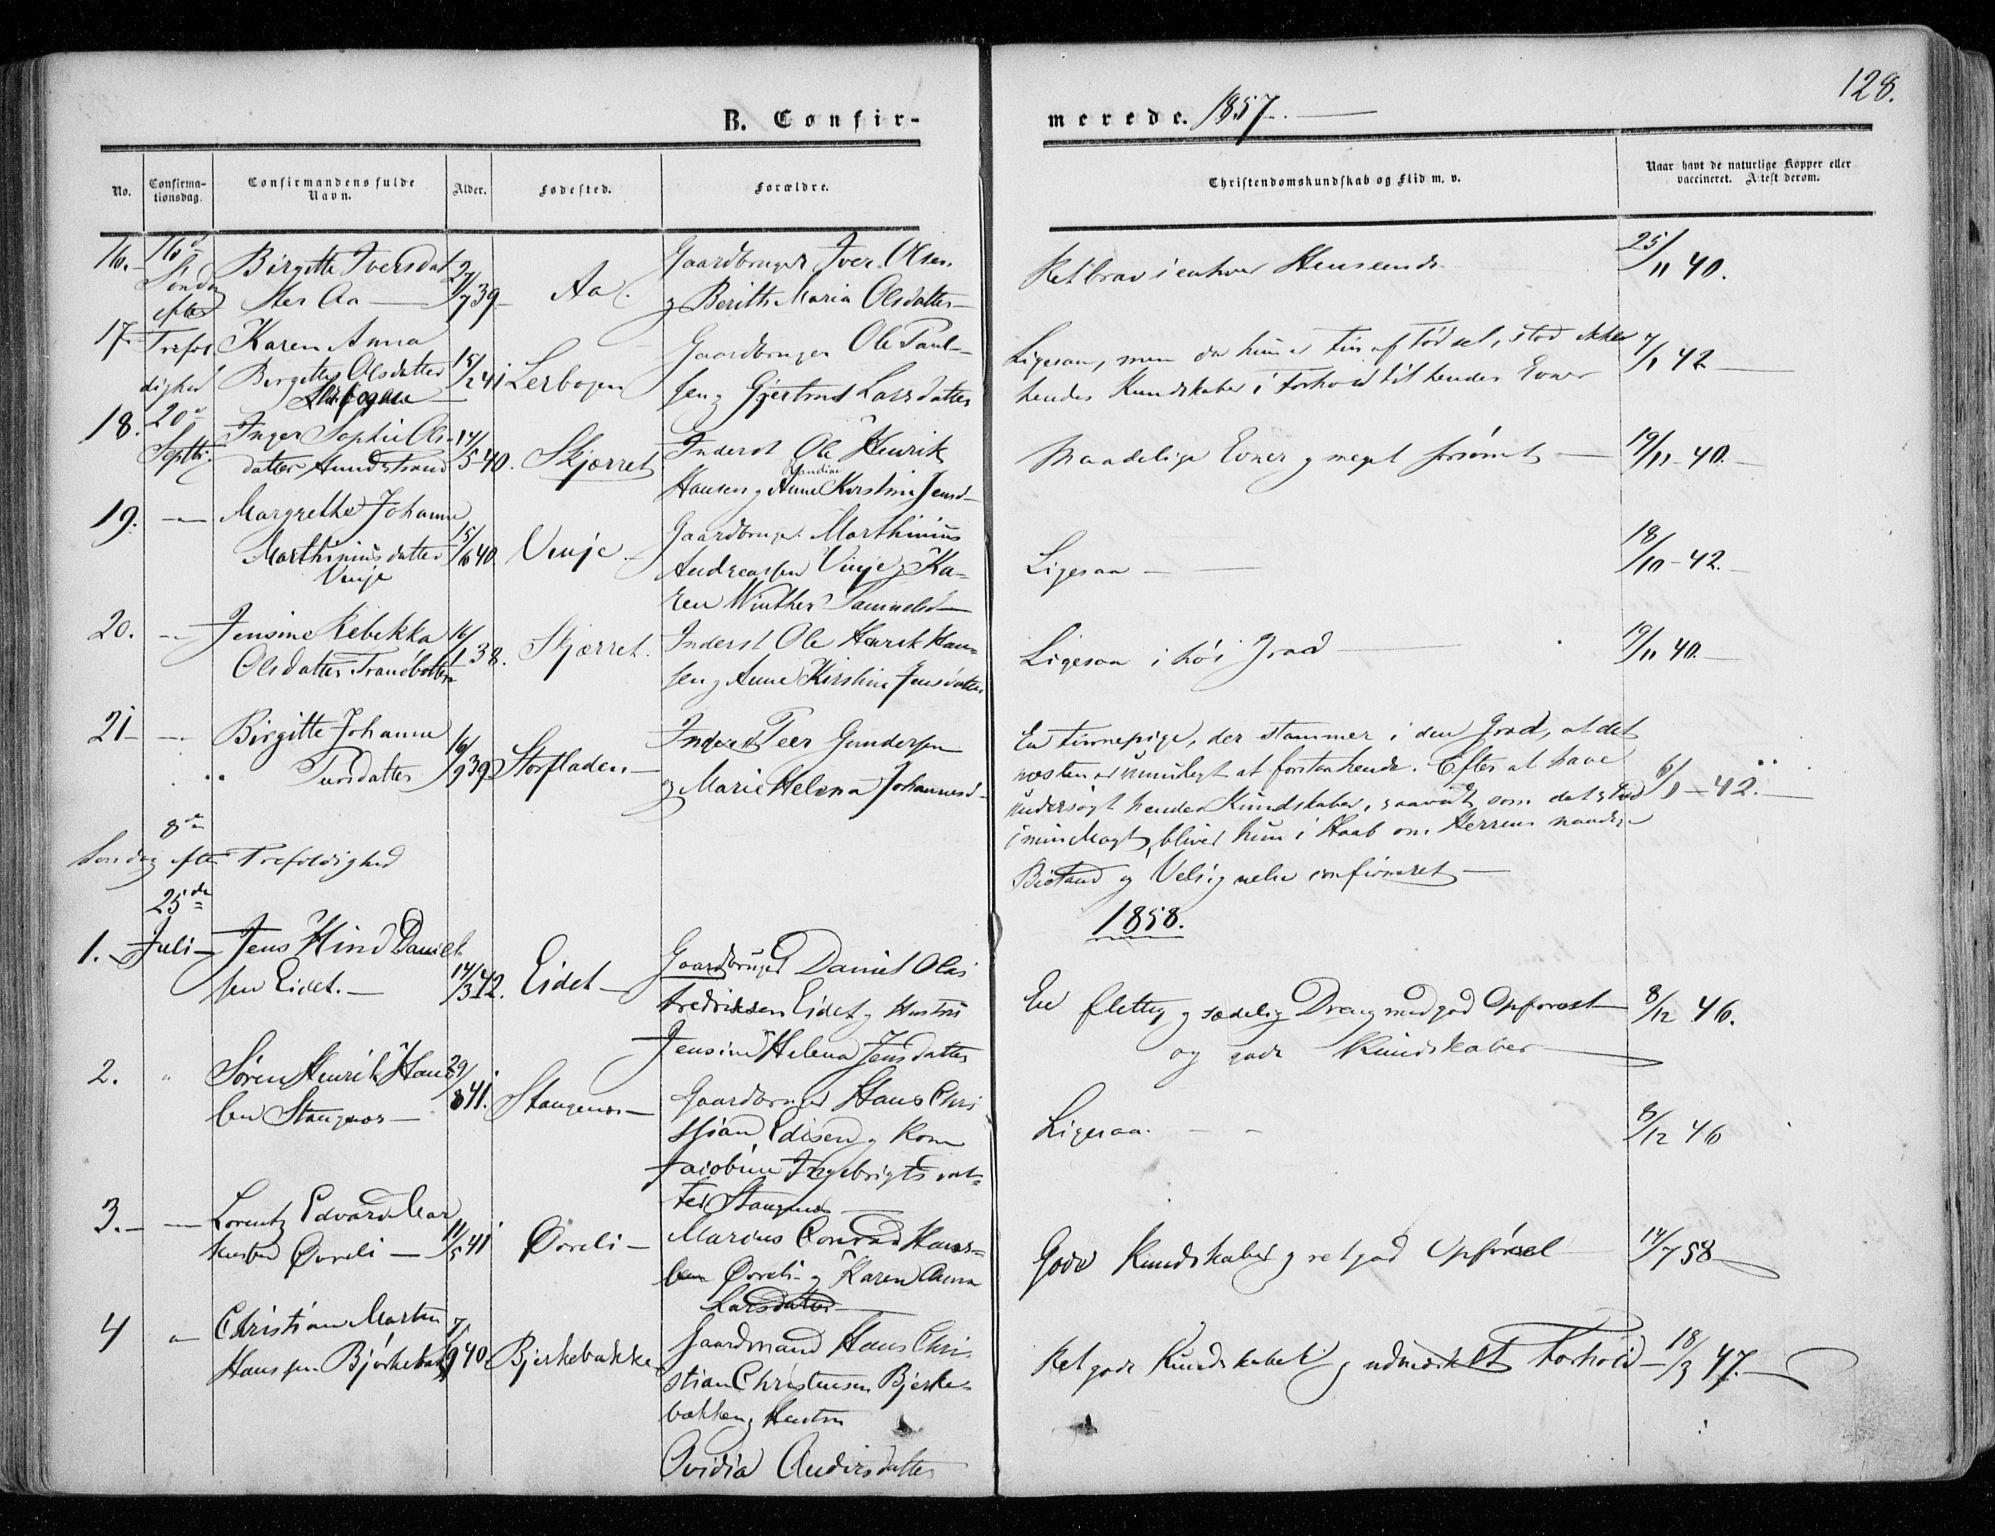 SATØ, Tranøy sokneprestkontor, I/Ia/Iaa/L0007kirke: Ministerialbok nr. 7, 1856-1866, s. 128